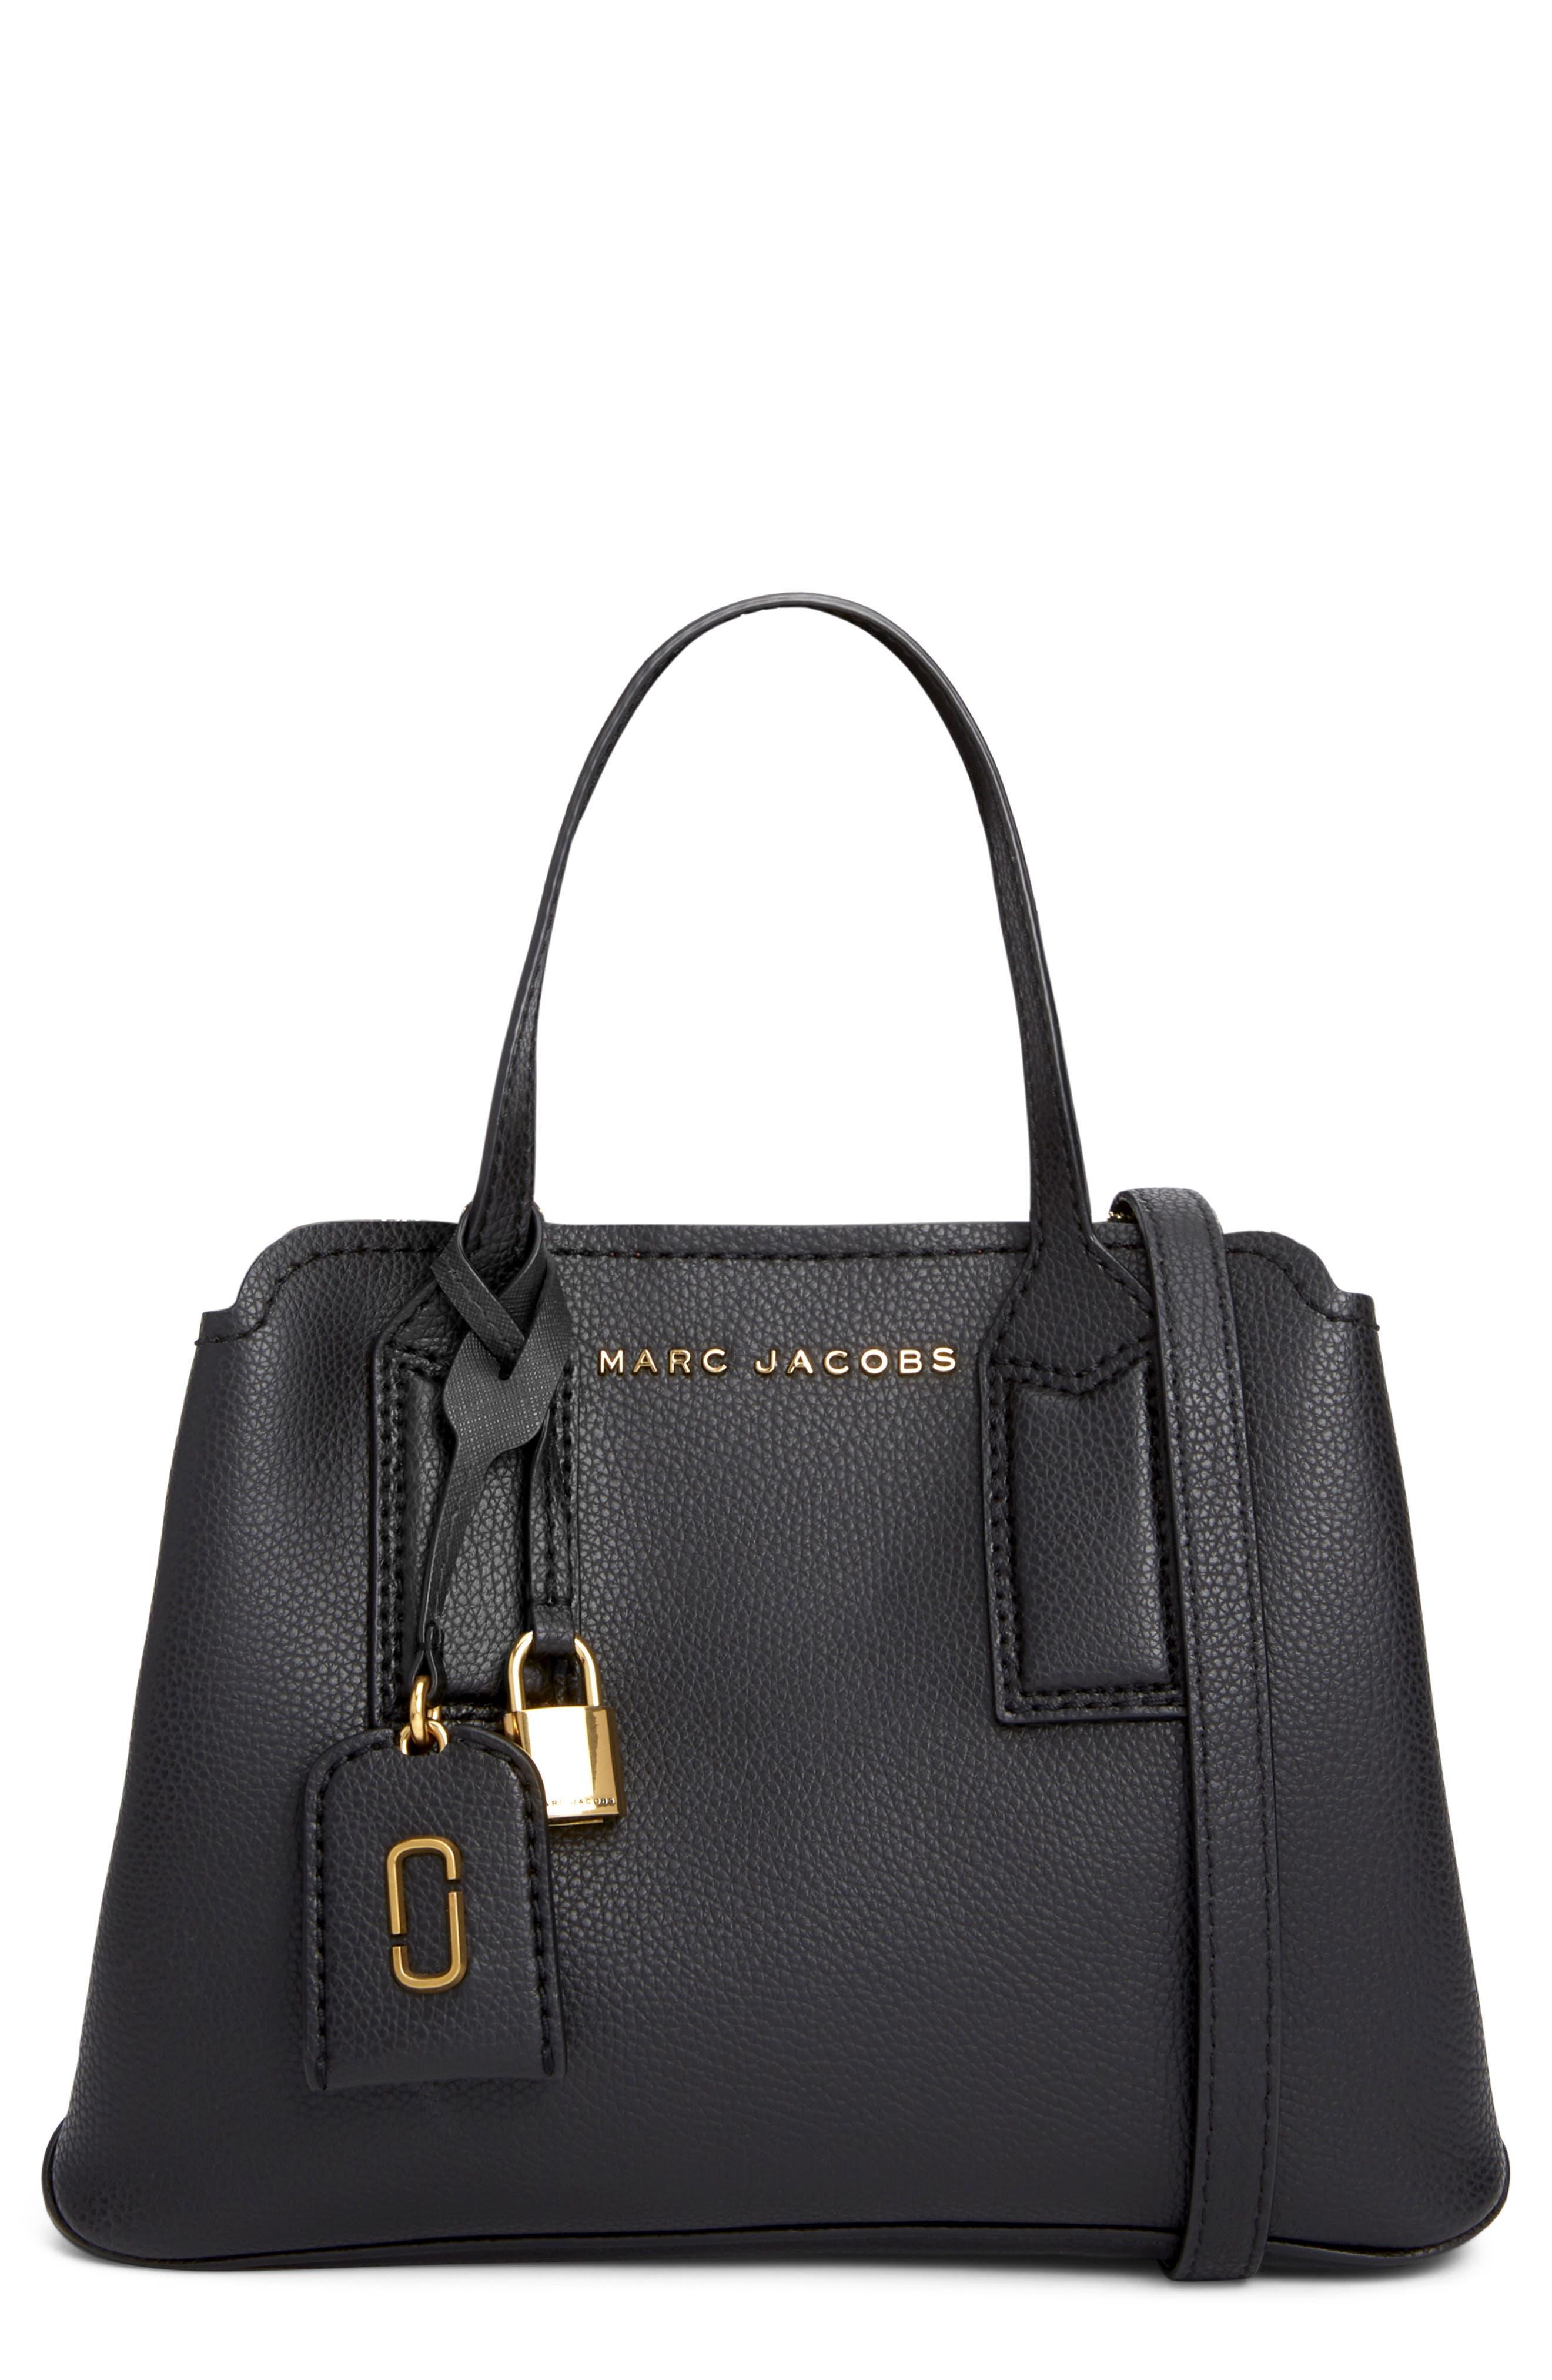 MARC JACOBS, The Editor 29 Leather Crossbody Bag, Main thumbnail 1, color, BLACK